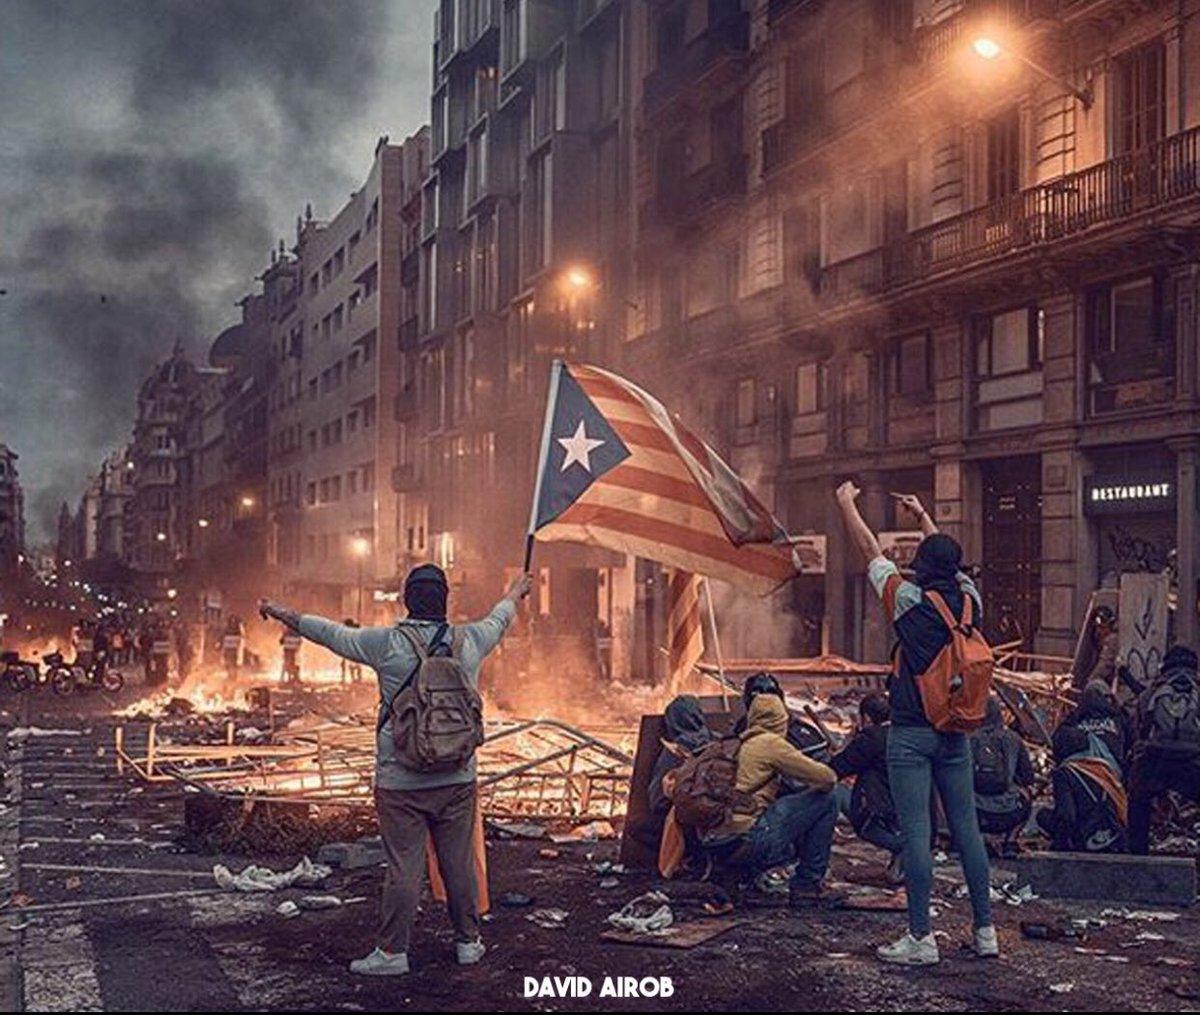 "SPANISH PRESS REACTIONS #HongKong ""Mass civil disobedience"" #Jakarta ""Mass civil disobedience"" #GiletsJaunes ""Mass civil disobedience"" #Haiti ""Mass civil disobedience"" #Peru ""Mass civil disobedience"" #Chile ""Mass civil disobedience"" #Catalonia ""Terrorism"" #ThisIsTheRealSpain <br>http://pic.twitter.com/yzGMLcwNgh"